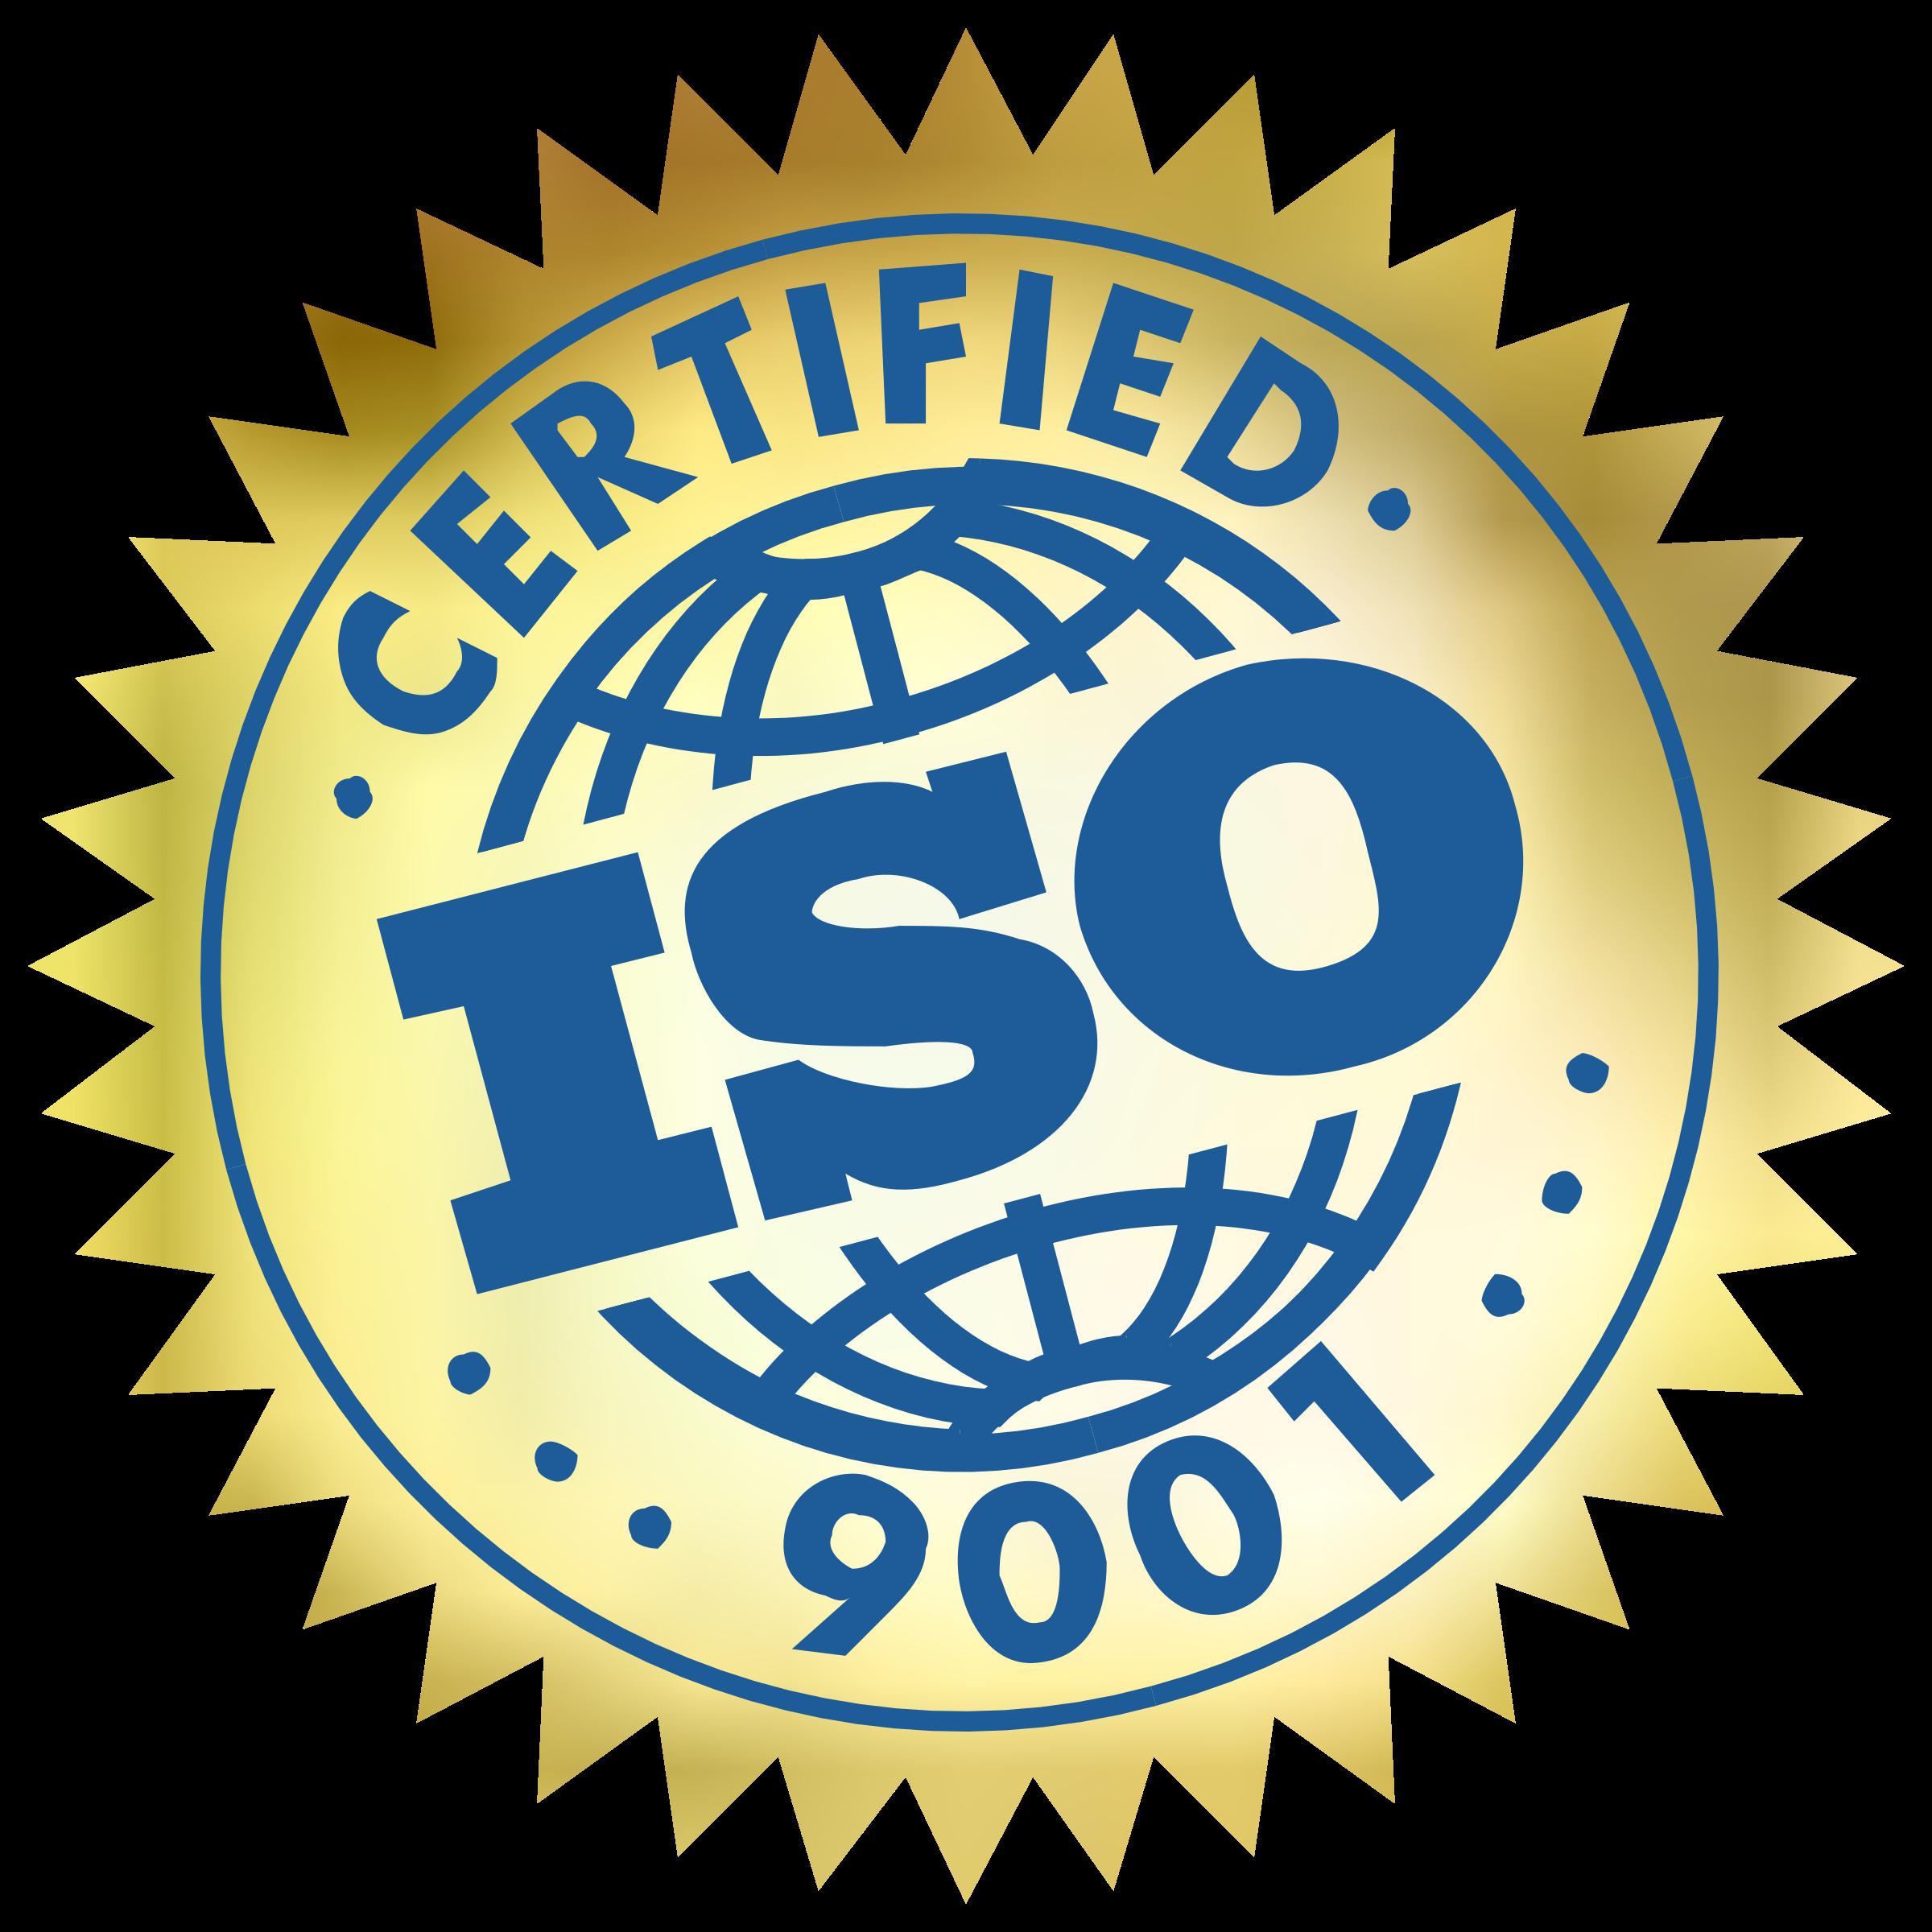 ISO 9001 Certified Logo PNG Transparent & SVG Vector.